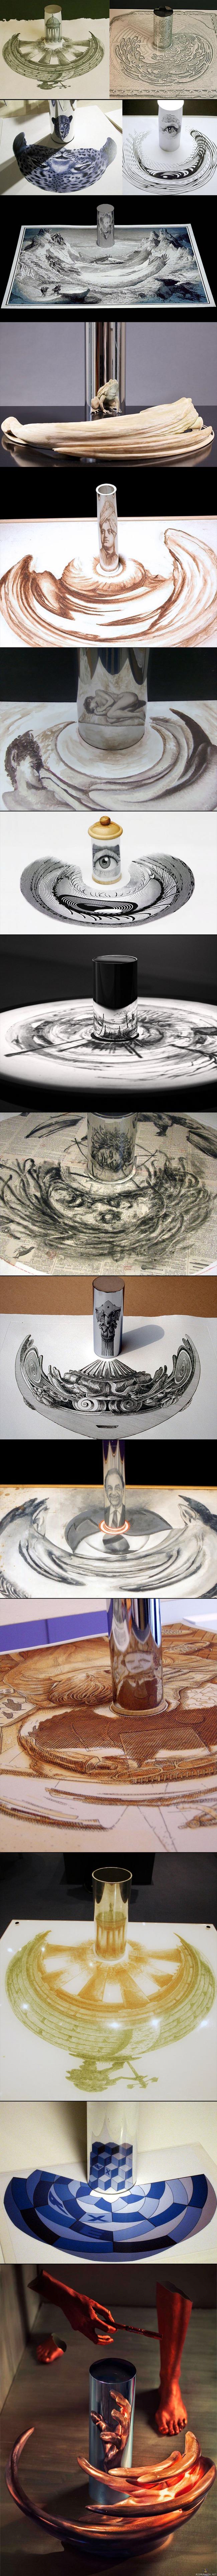 Anamorfoosi taidetta